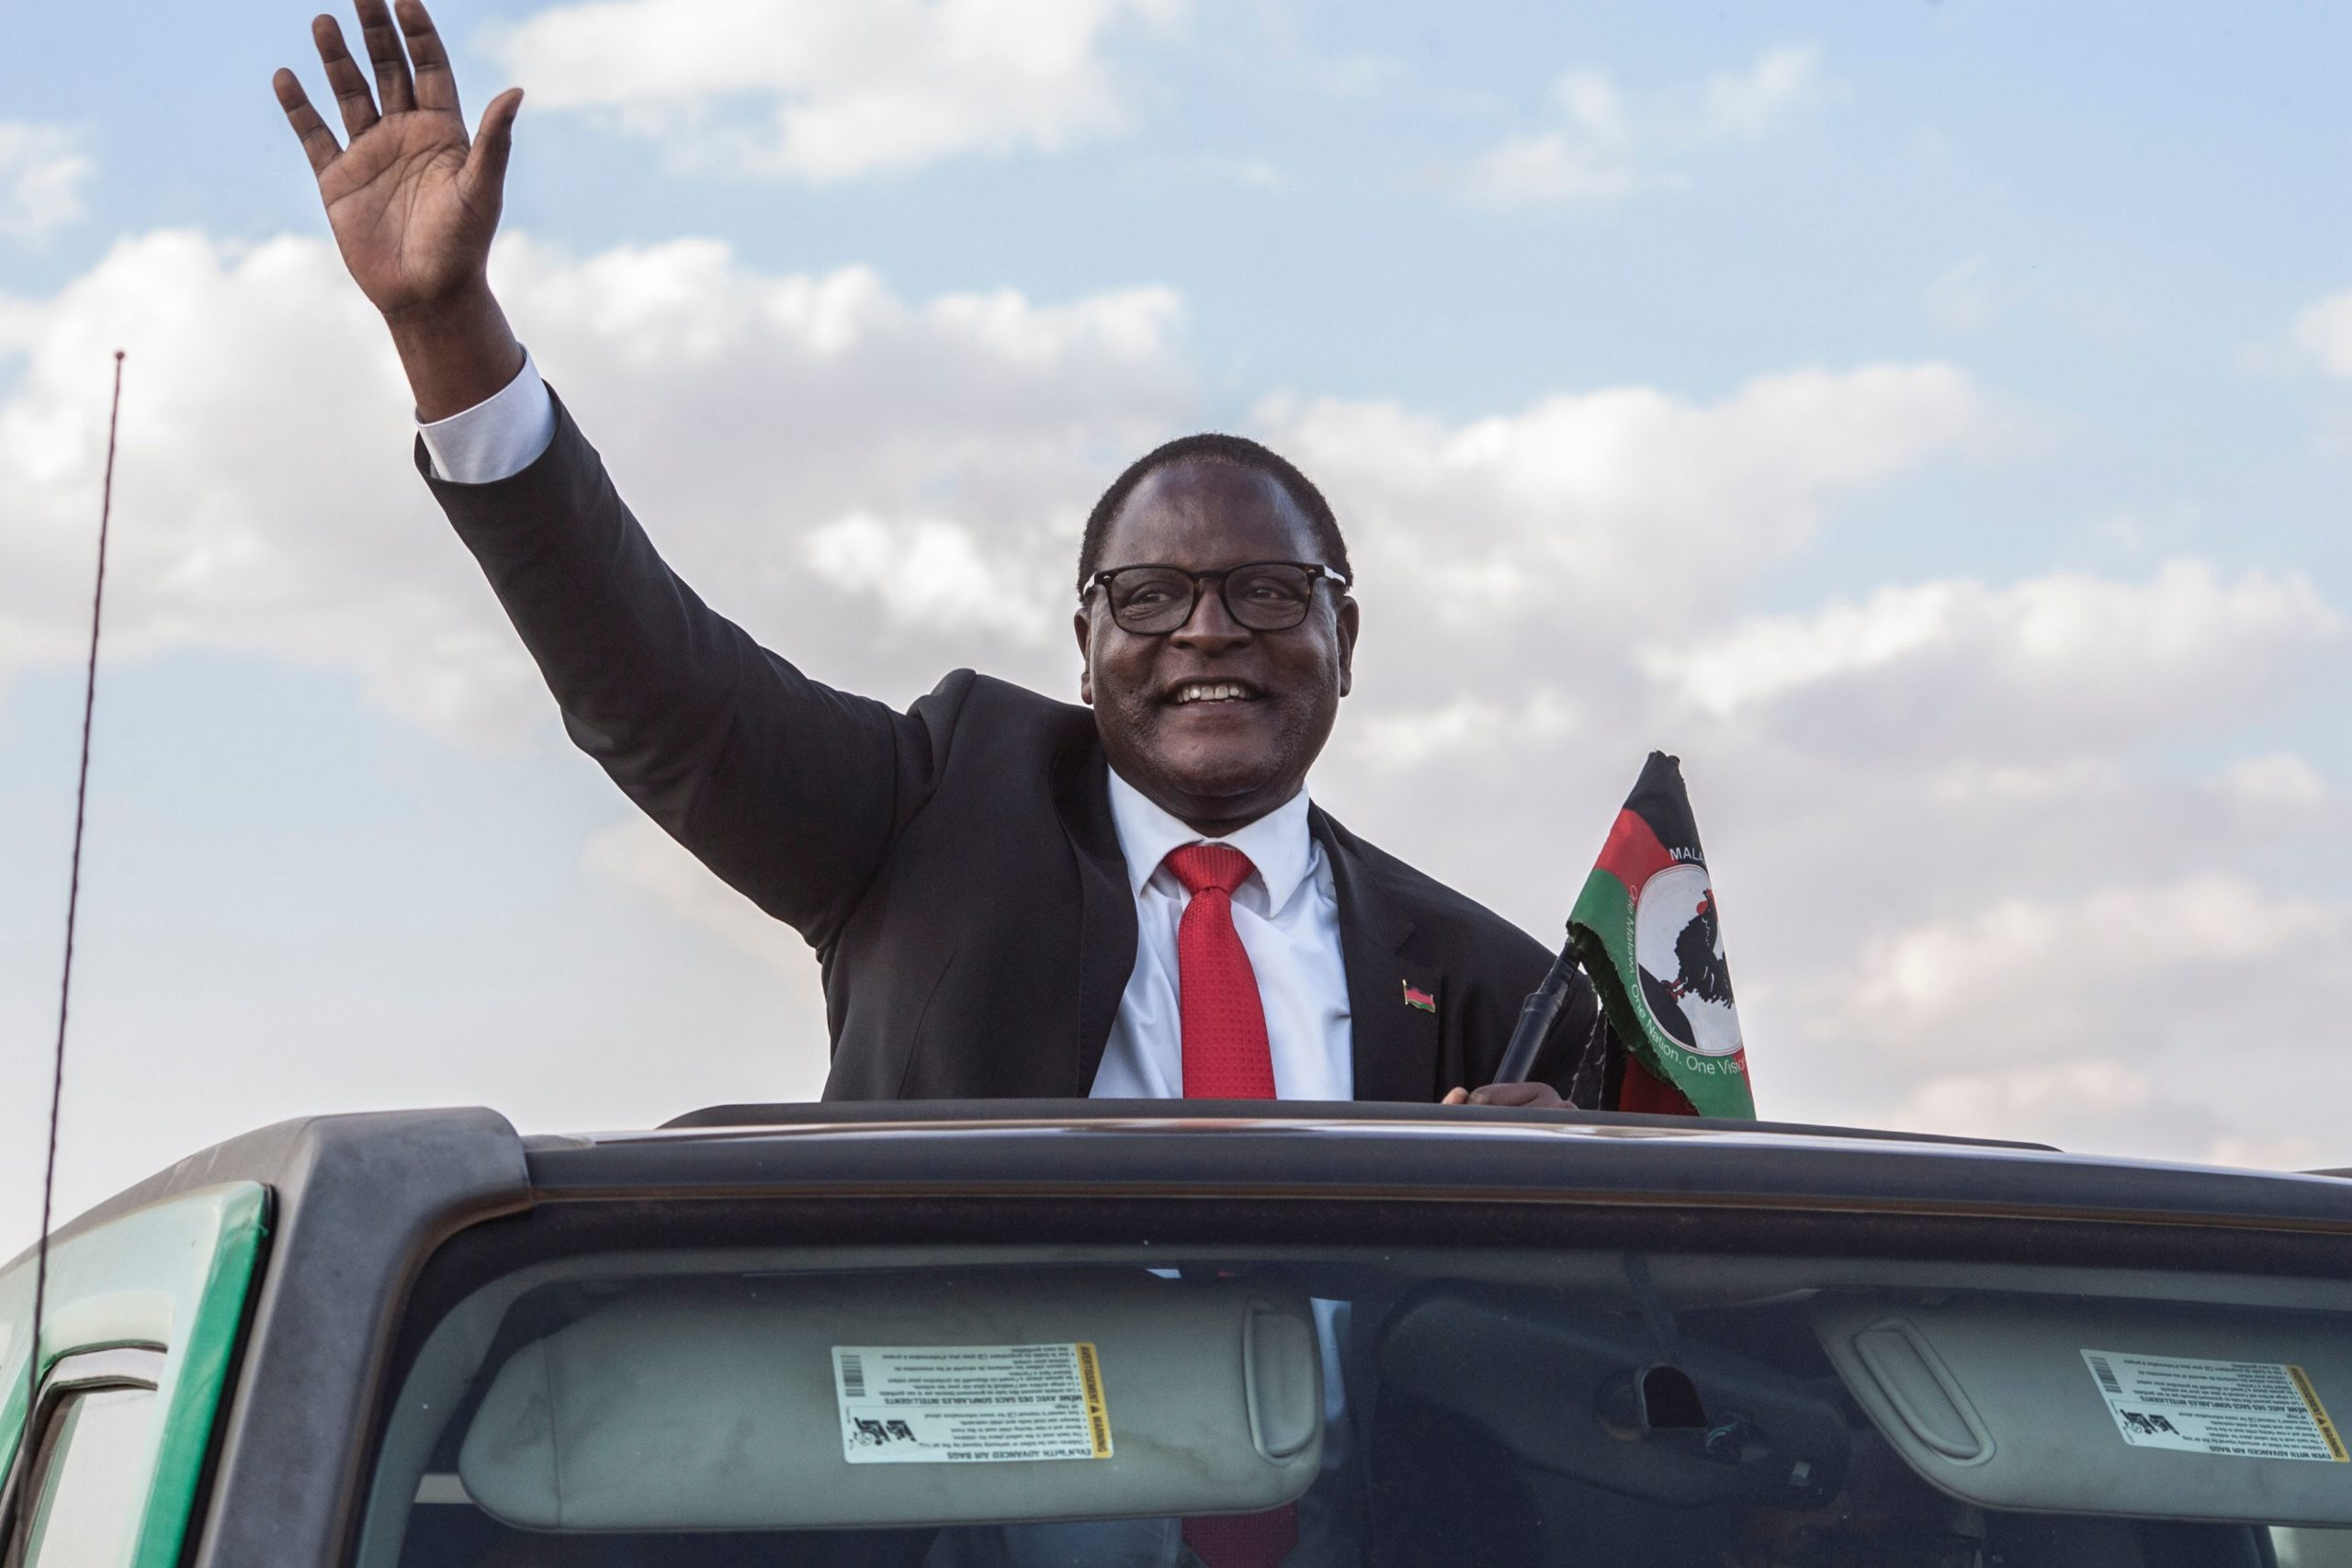 MALAWI-VOTE